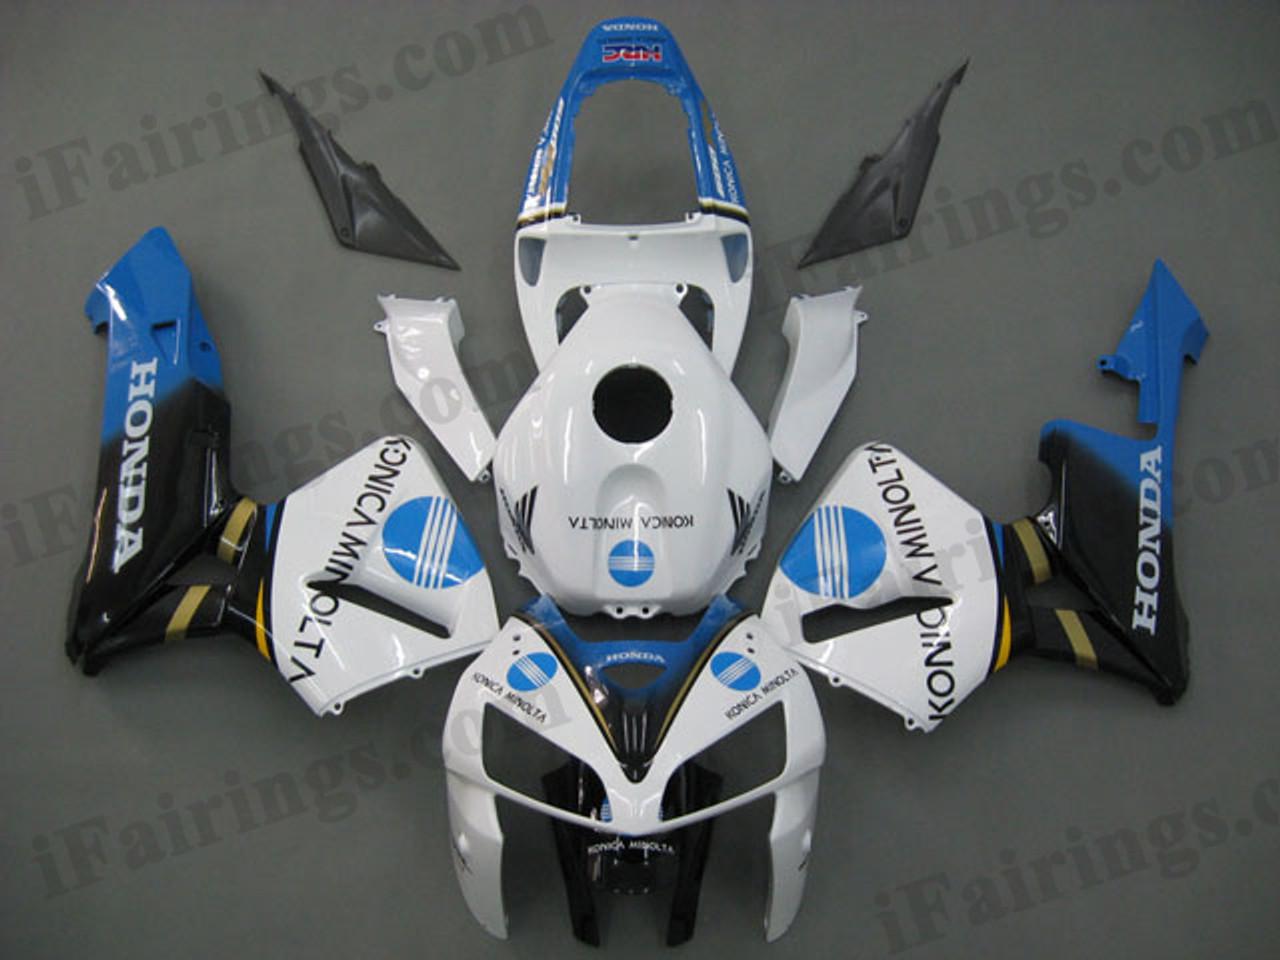 2005 2006 Cbr600rr Konica Minolta Fairings And Body Kits